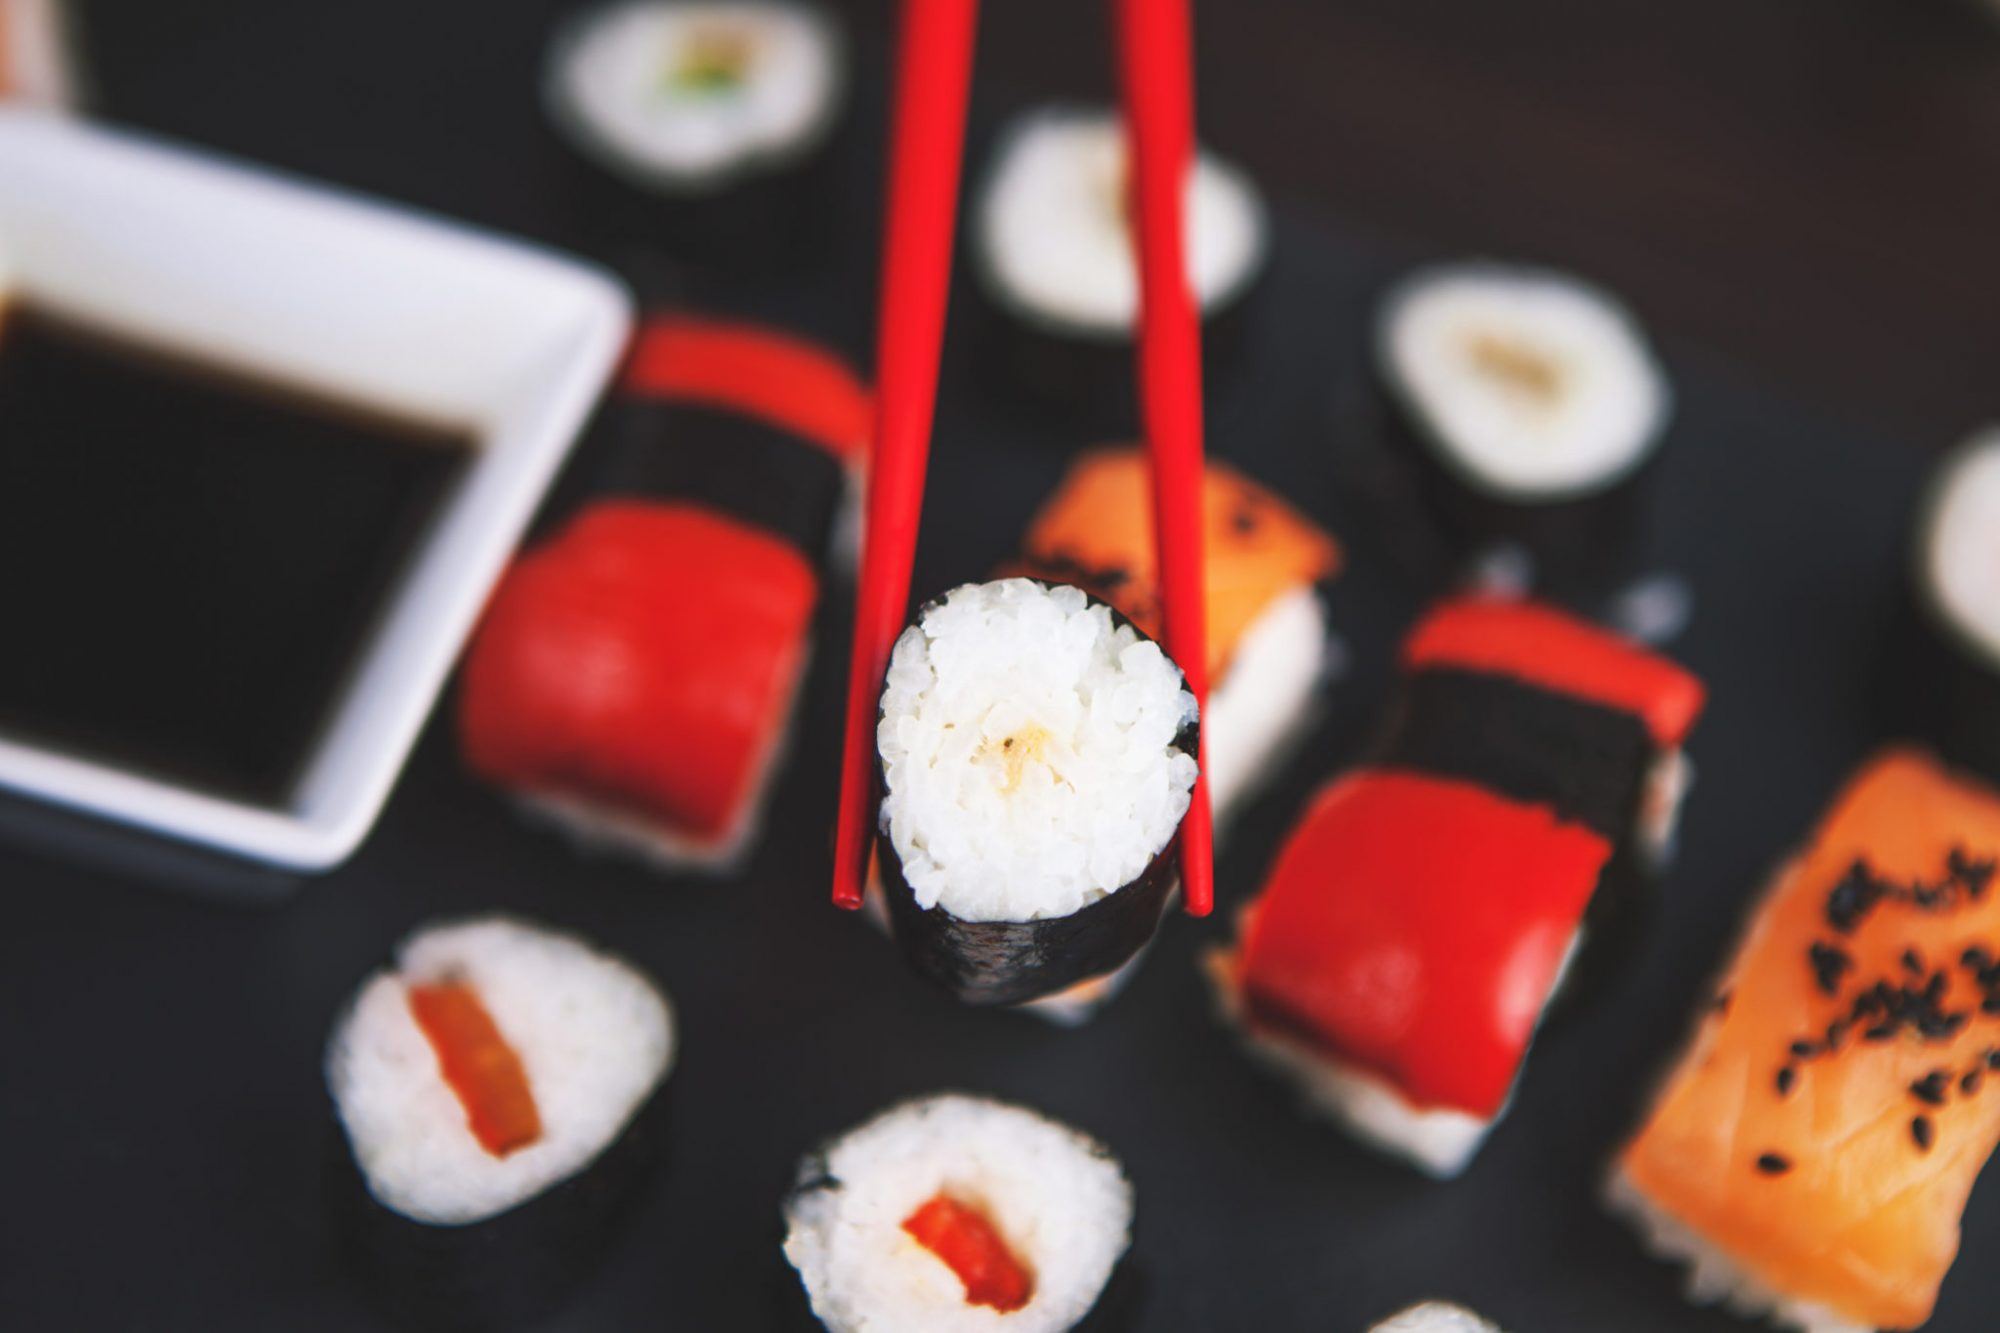 Sushi japanese chopsticks gifts present